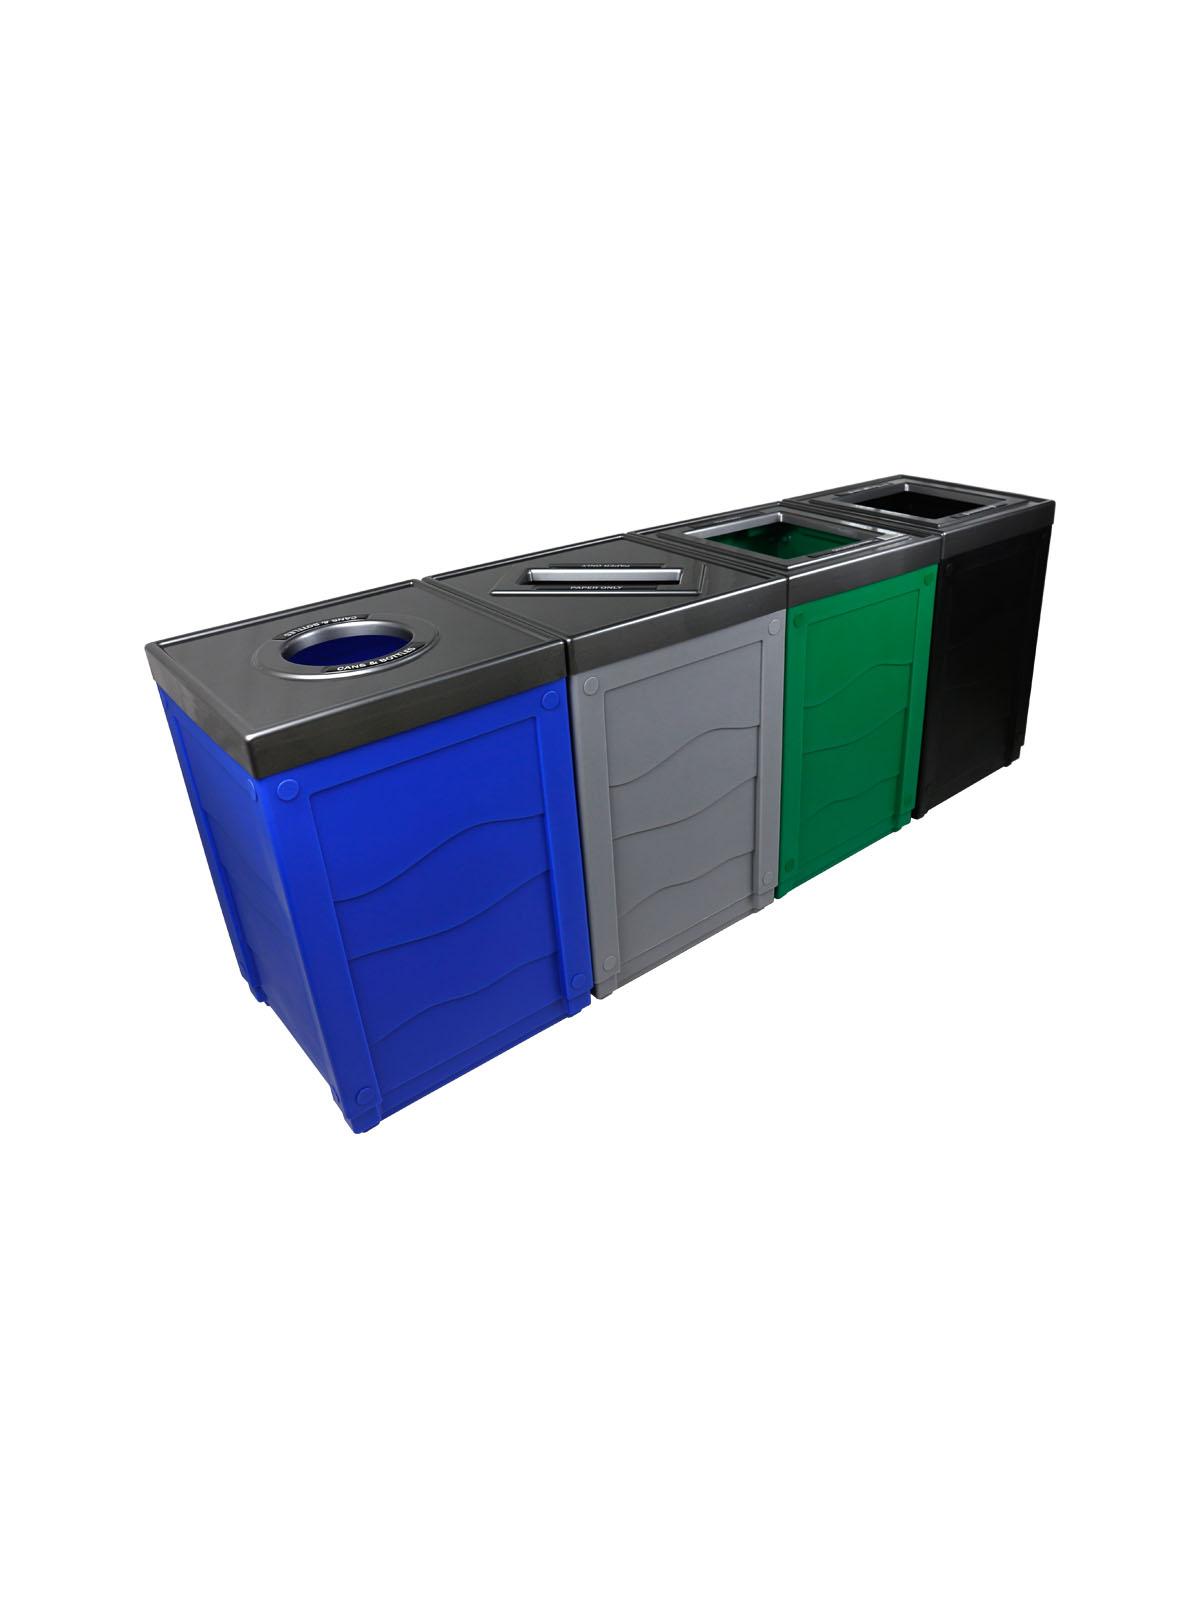 EVOLVE - Quad - Cans & Bottles-Paper-Organics-Waste - Full-Circle-Slot-Full - Blue-Grey-Green-Black